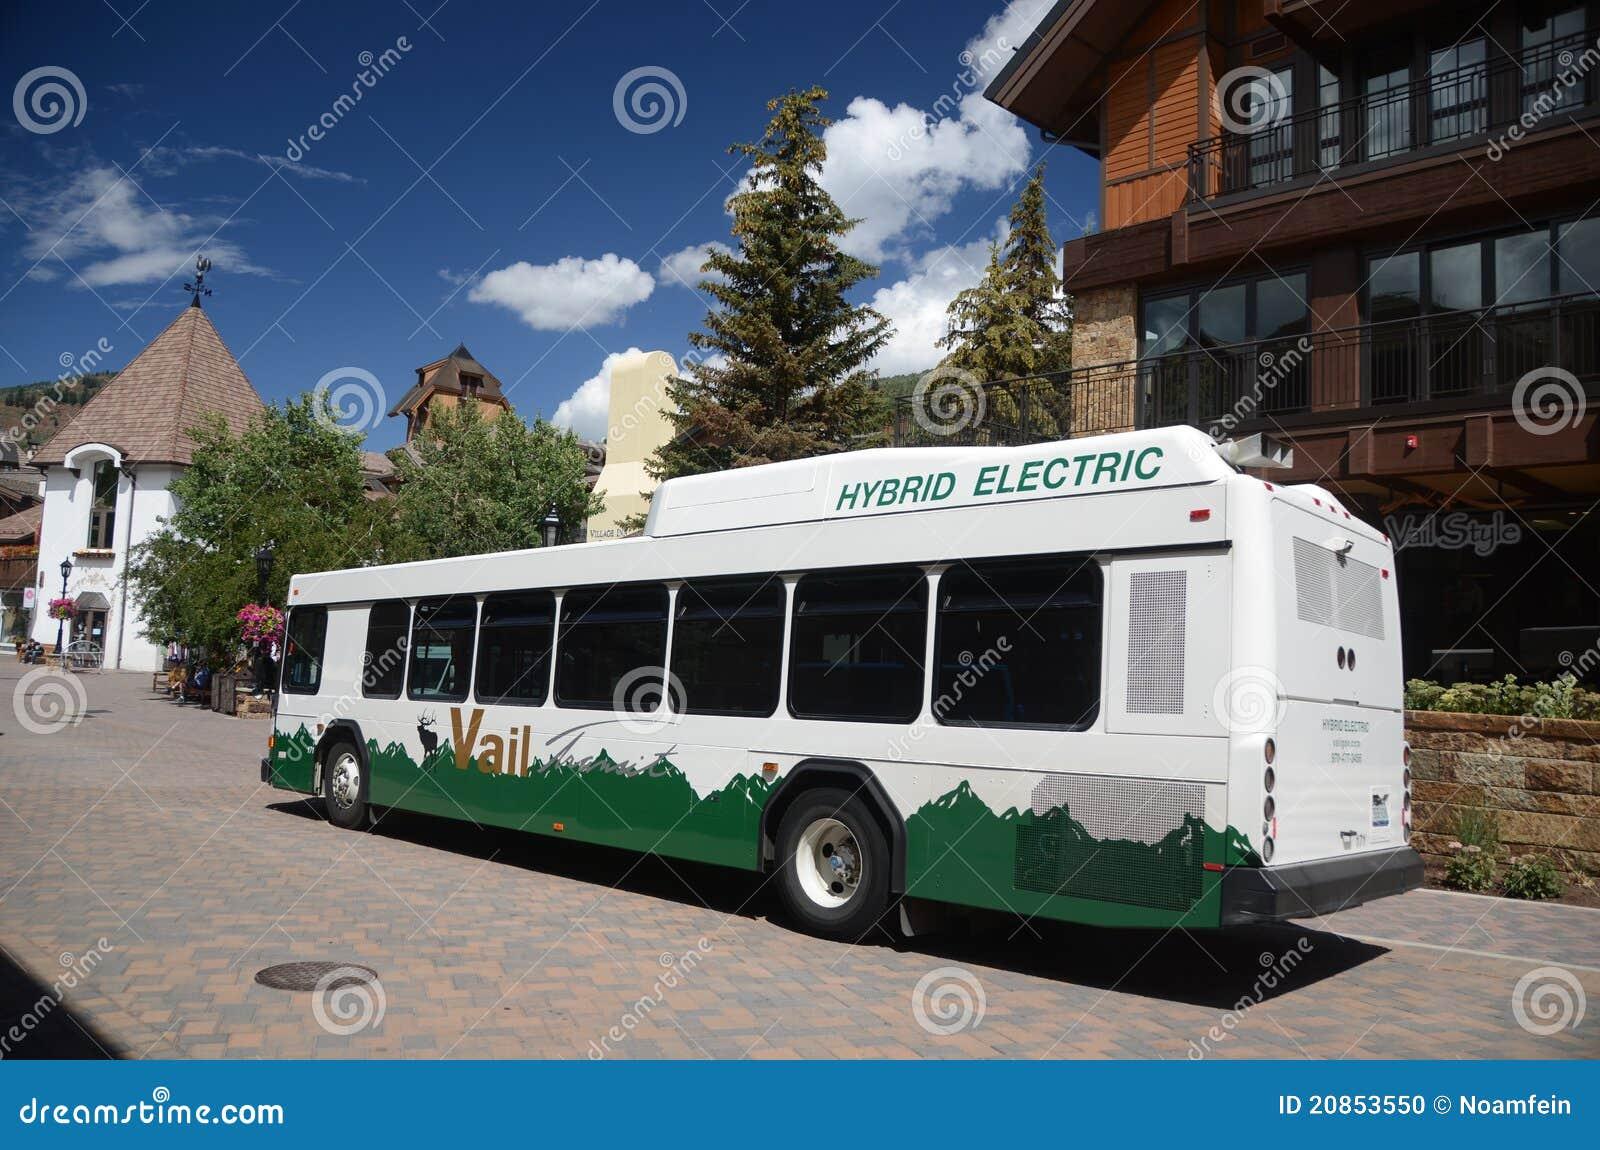 electric bus in vail, colorado editorial image - image of hybrid